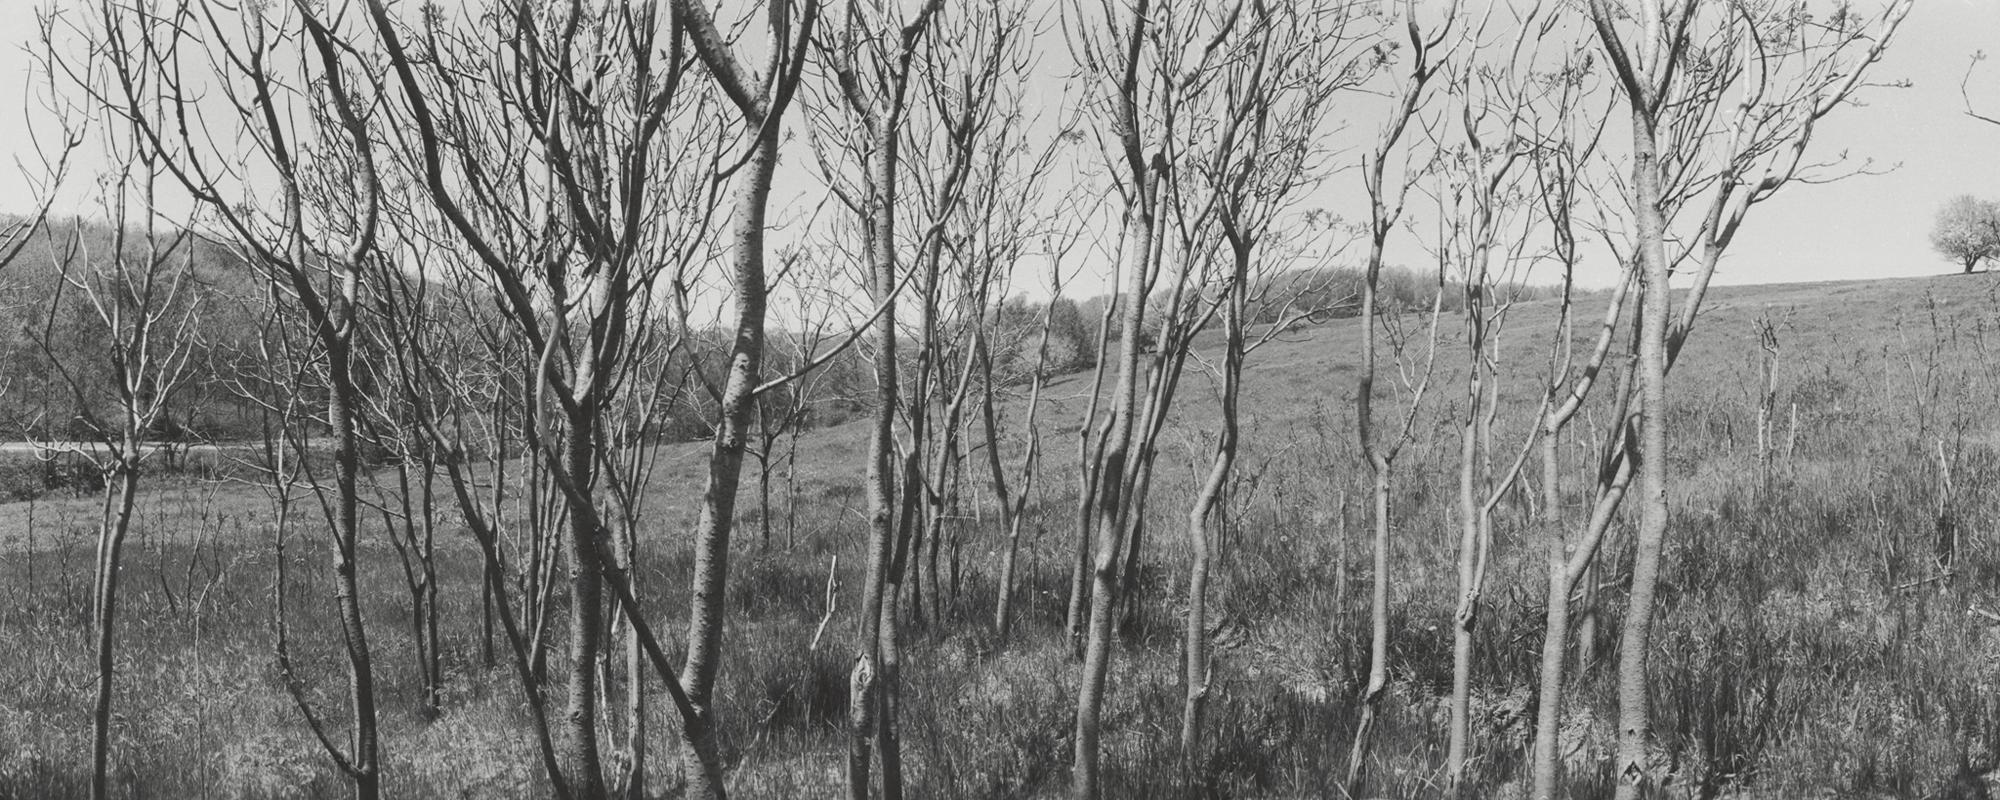 Laura Volkerding, Sumac Grove, Westby, Wisconsin (detail), 1978, Laura Volkerding Archive, 96.96.47